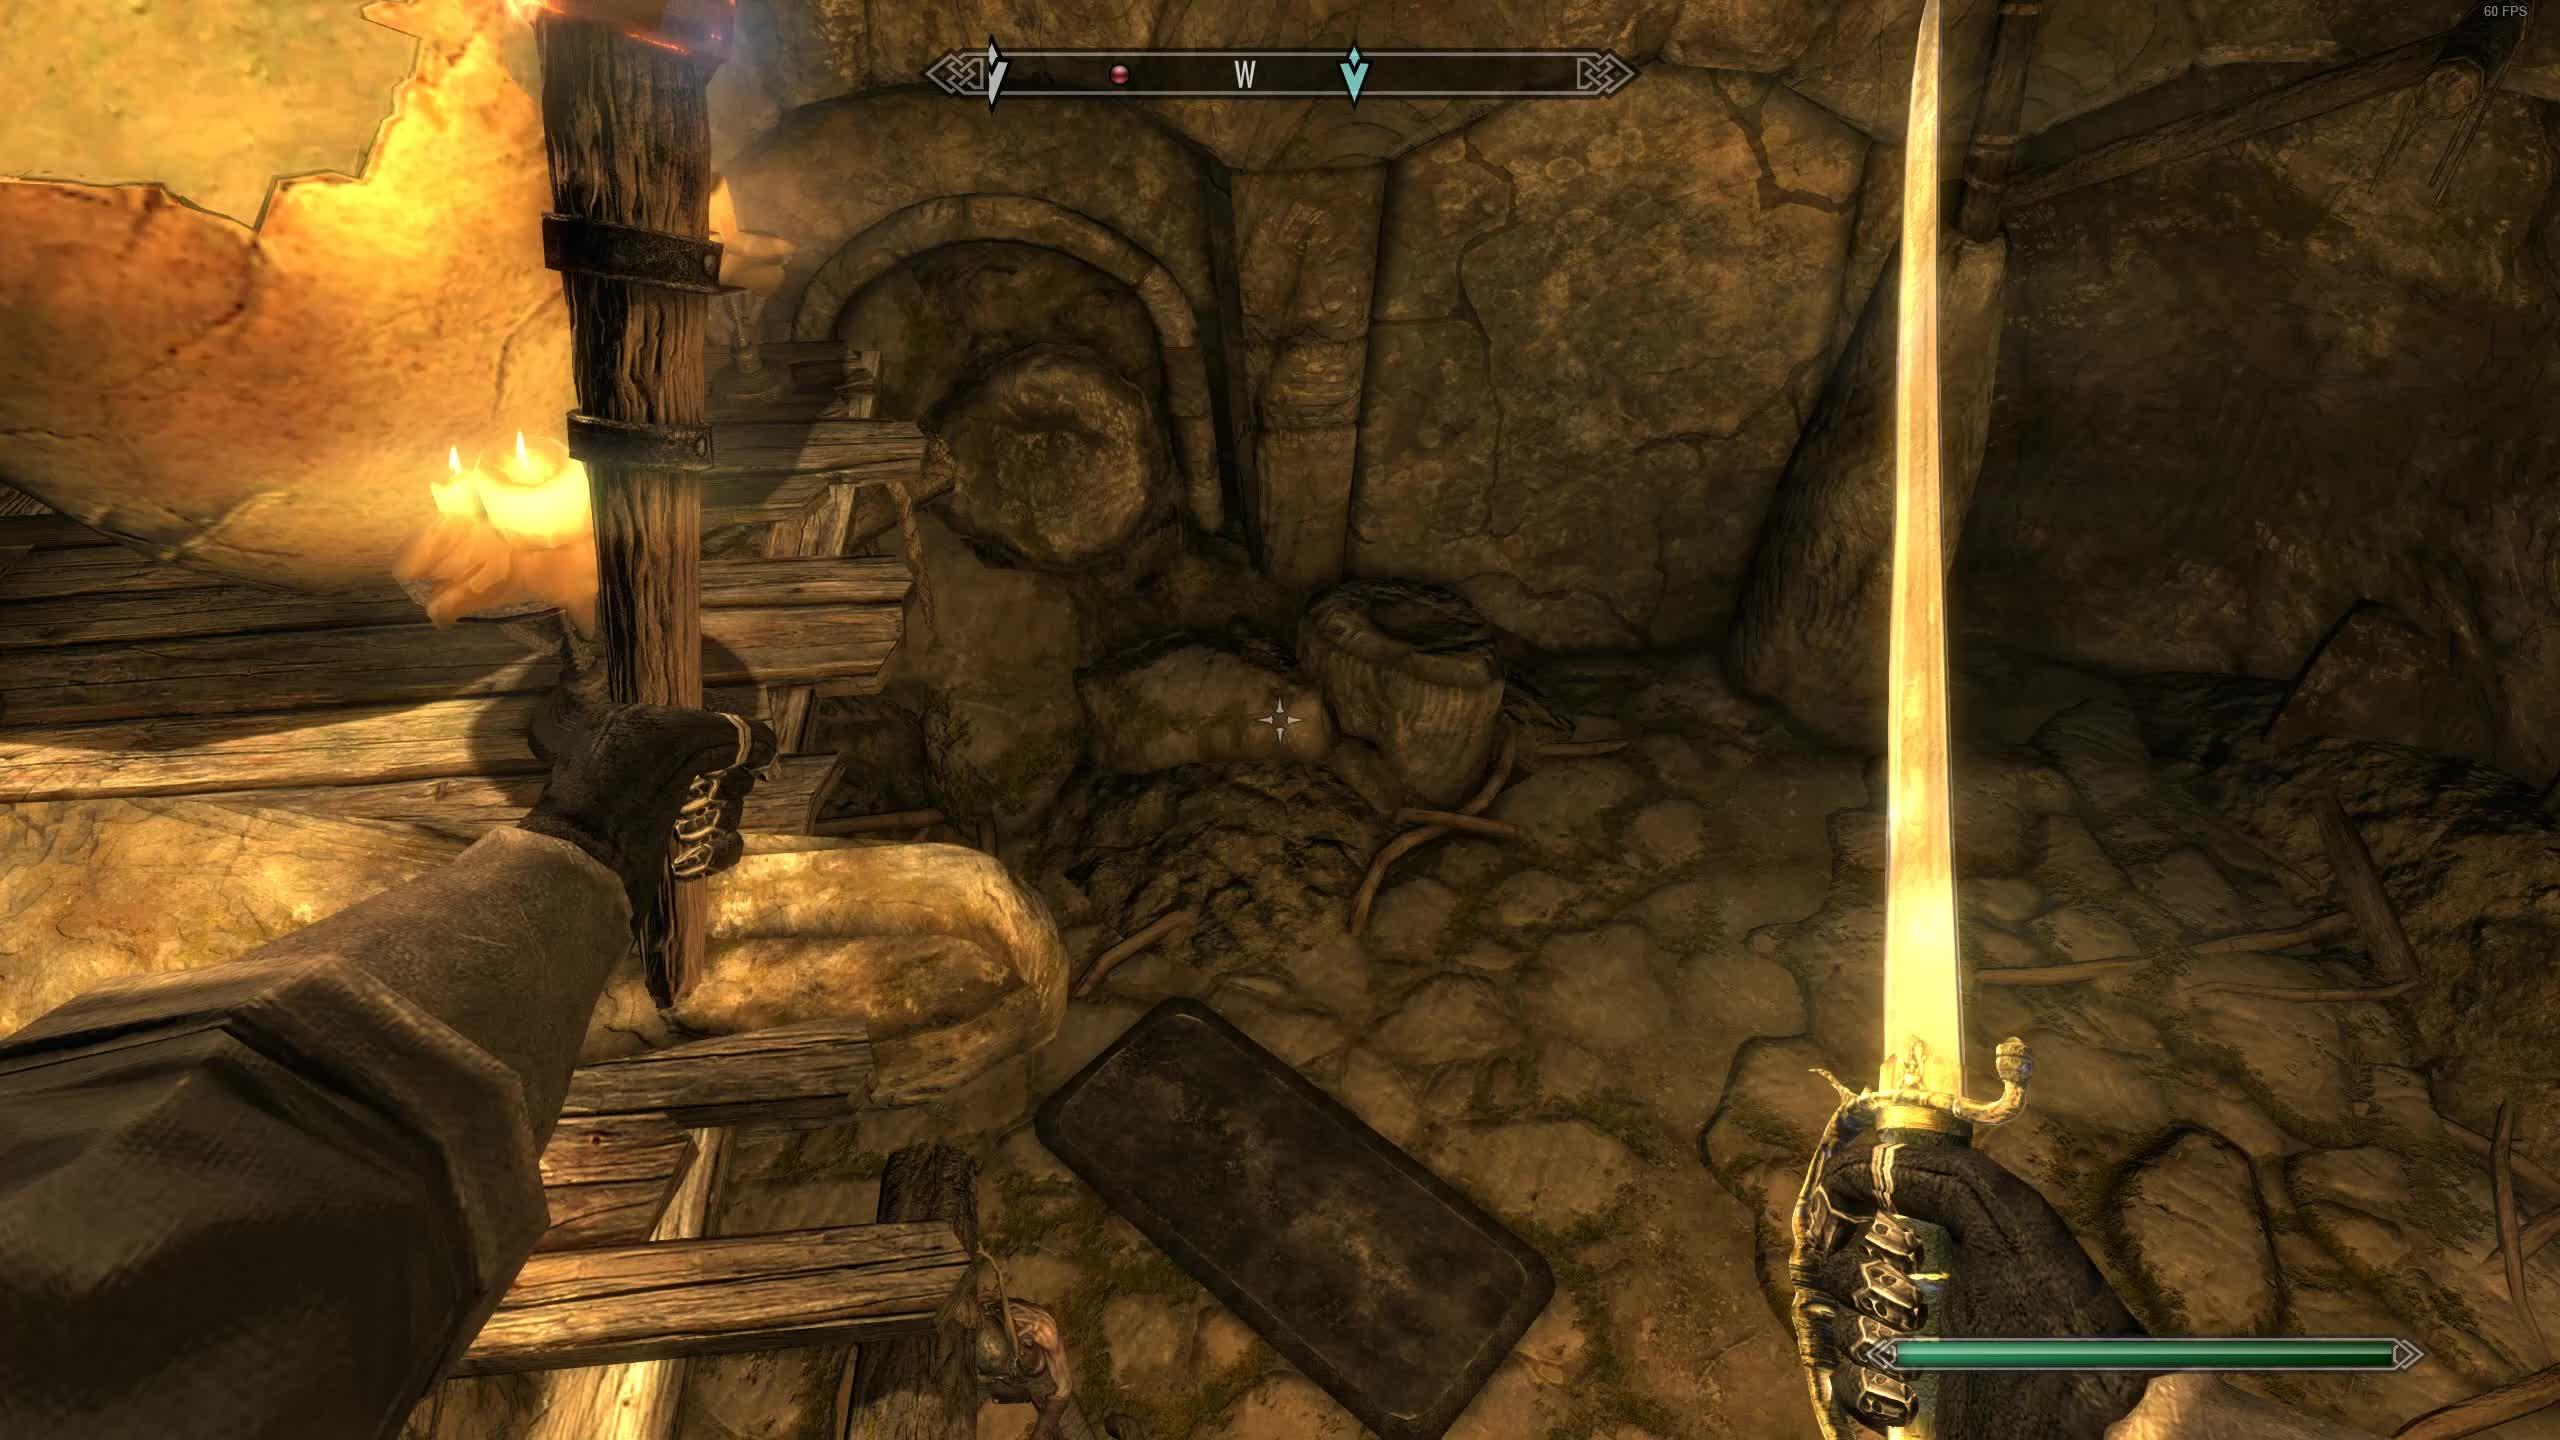 Elderscrolls, Nord, Skyrim, TES, Fun Skyrim duel GIFs